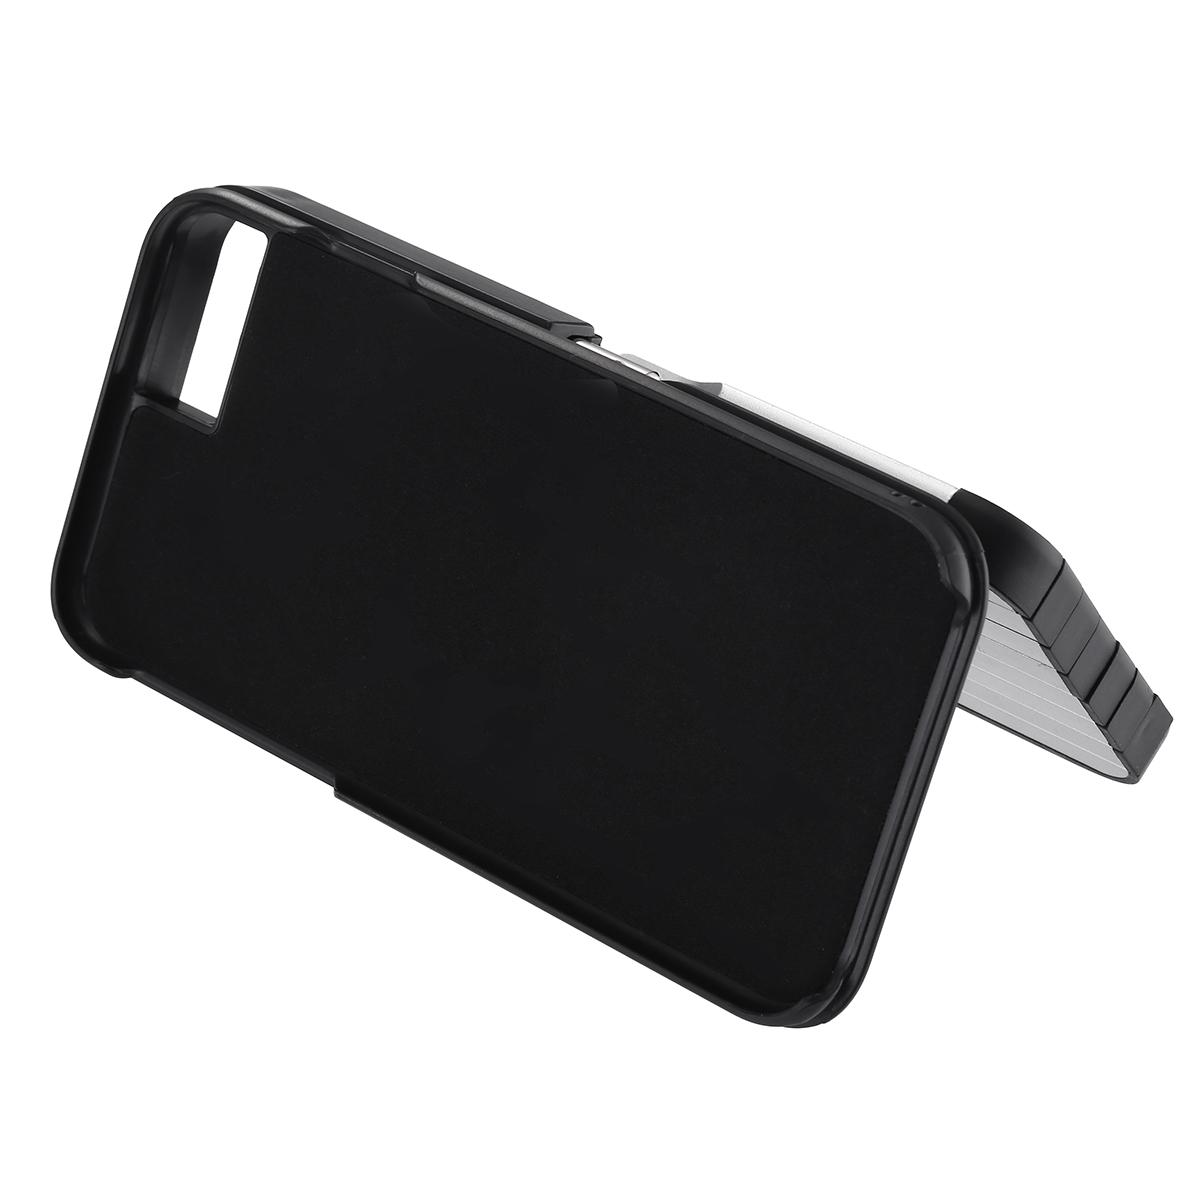 luxury aluminum stikbox selfie stick phone case cover monopod for iphone 6 6s. Black Bedroom Furniture Sets. Home Design Ideas